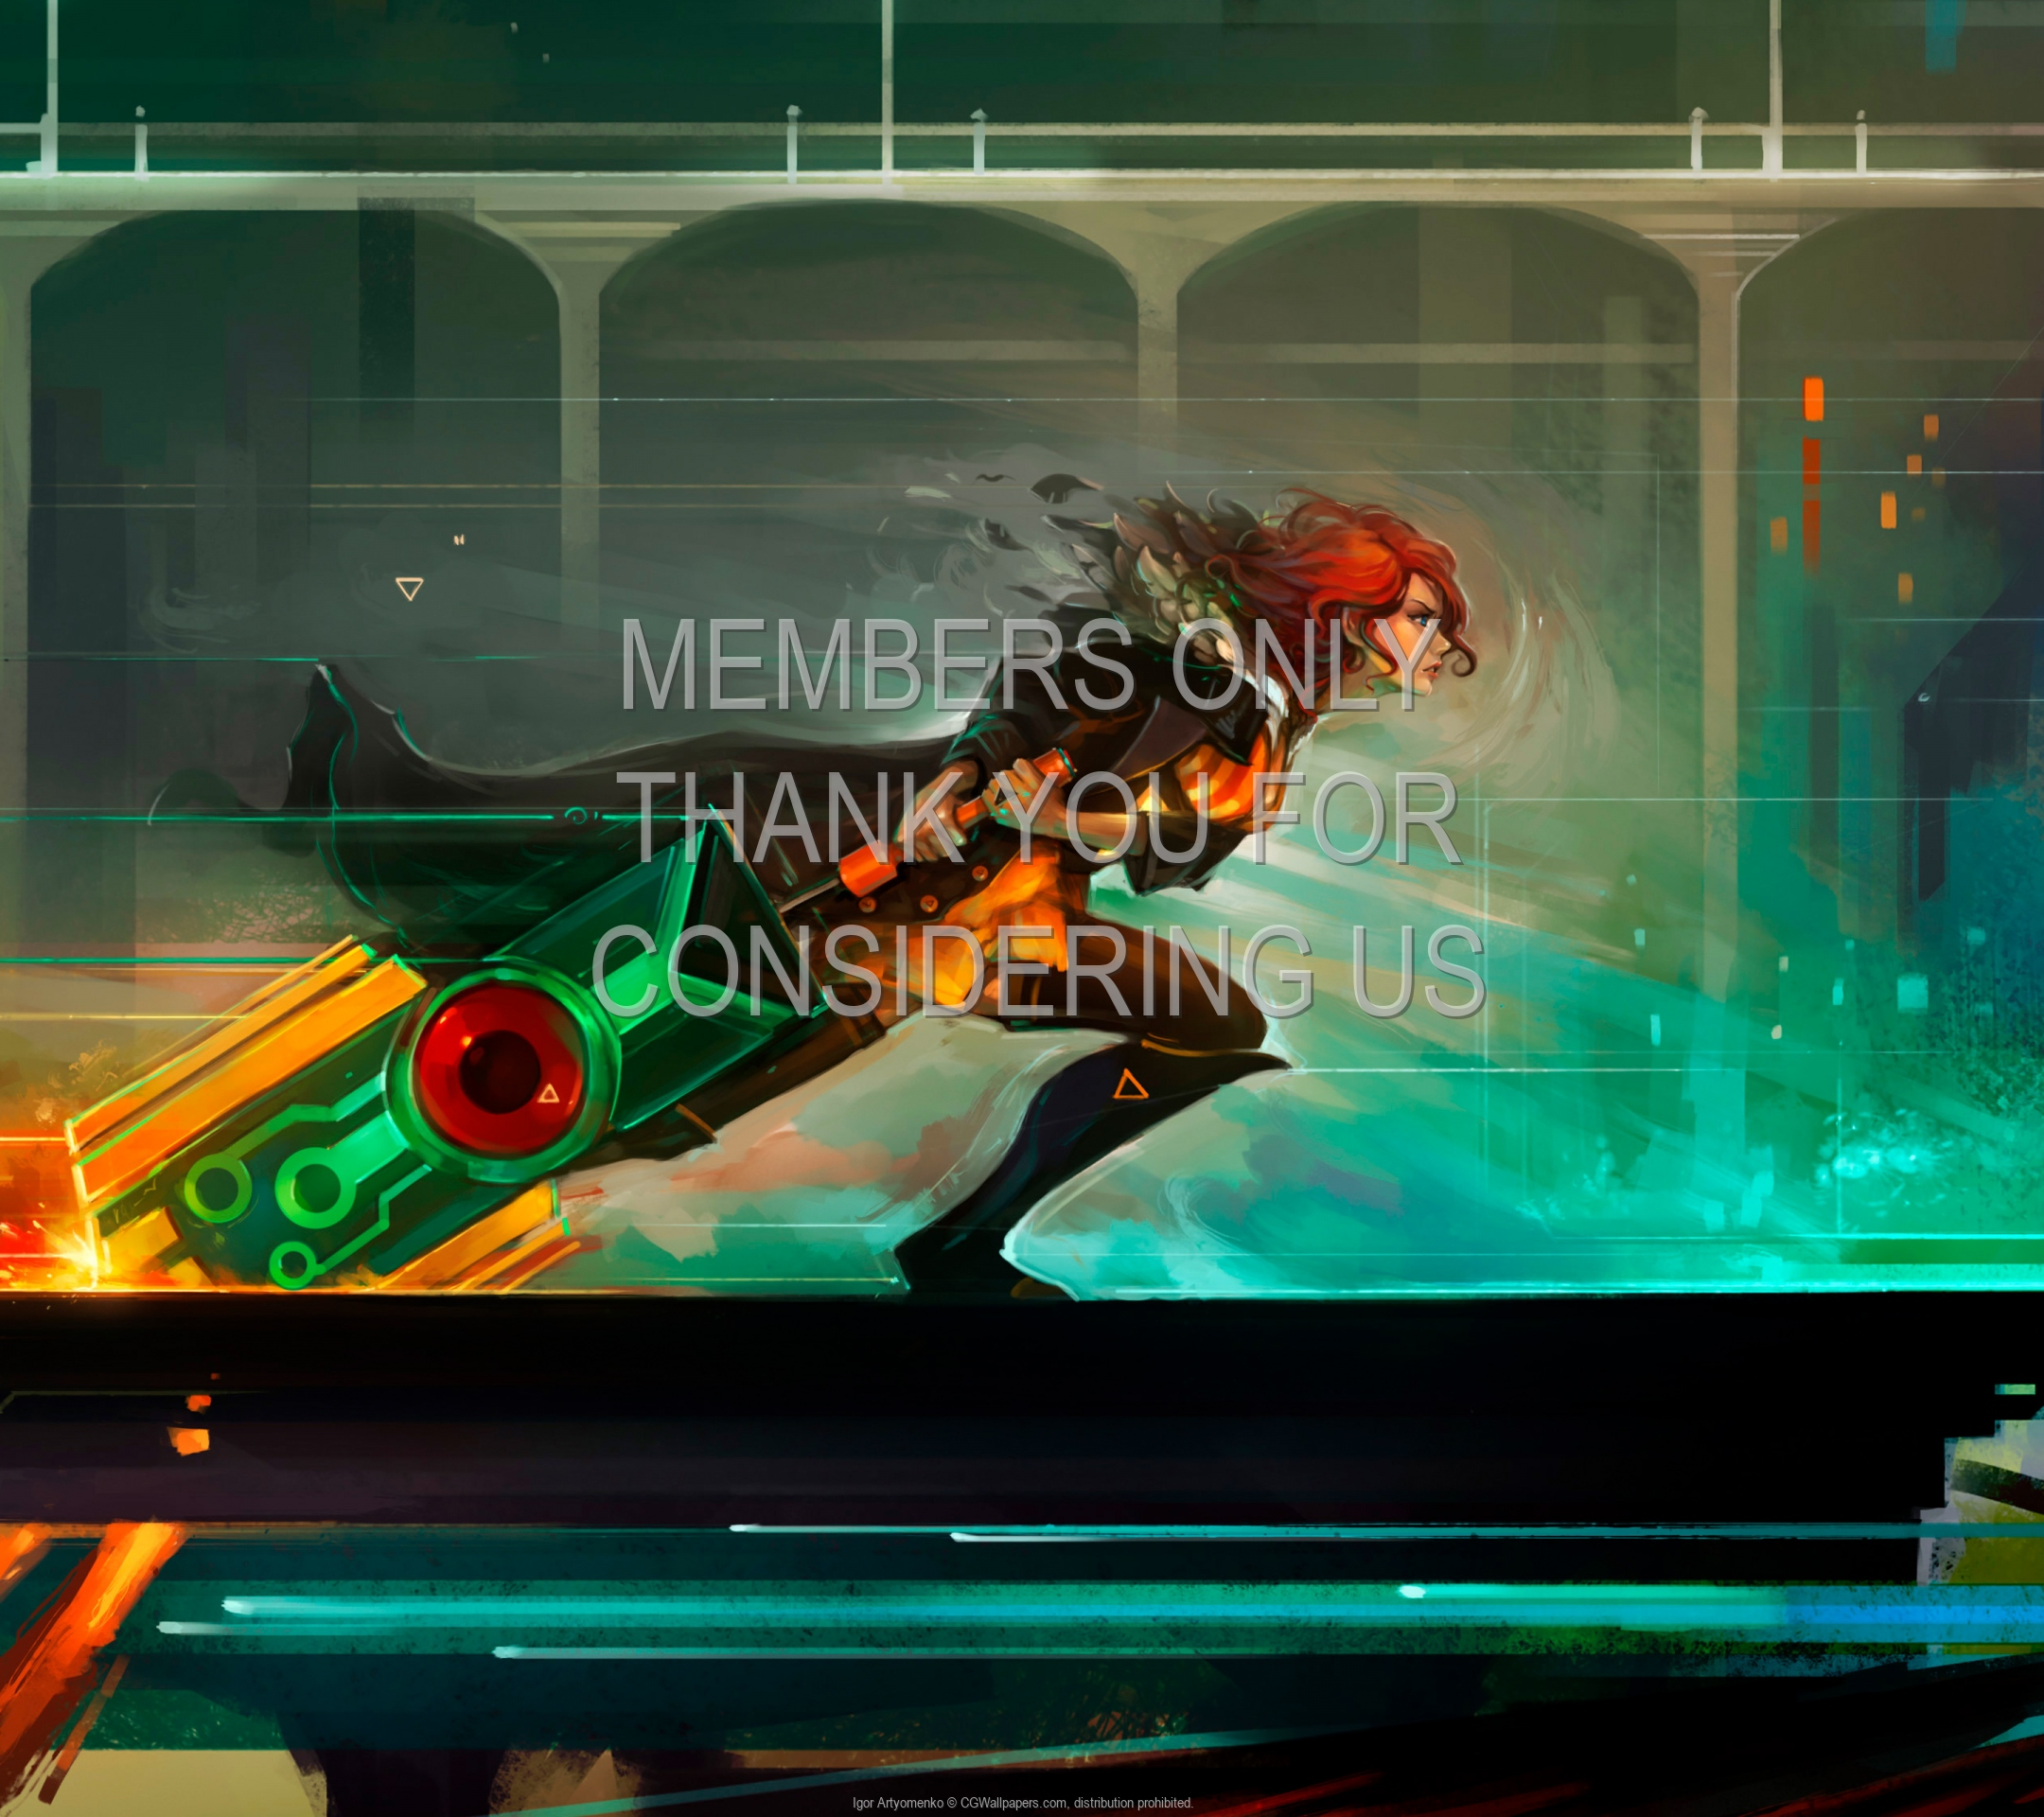 Igor Artyomenko 1920x1080 Mobile wallpaper or background 02